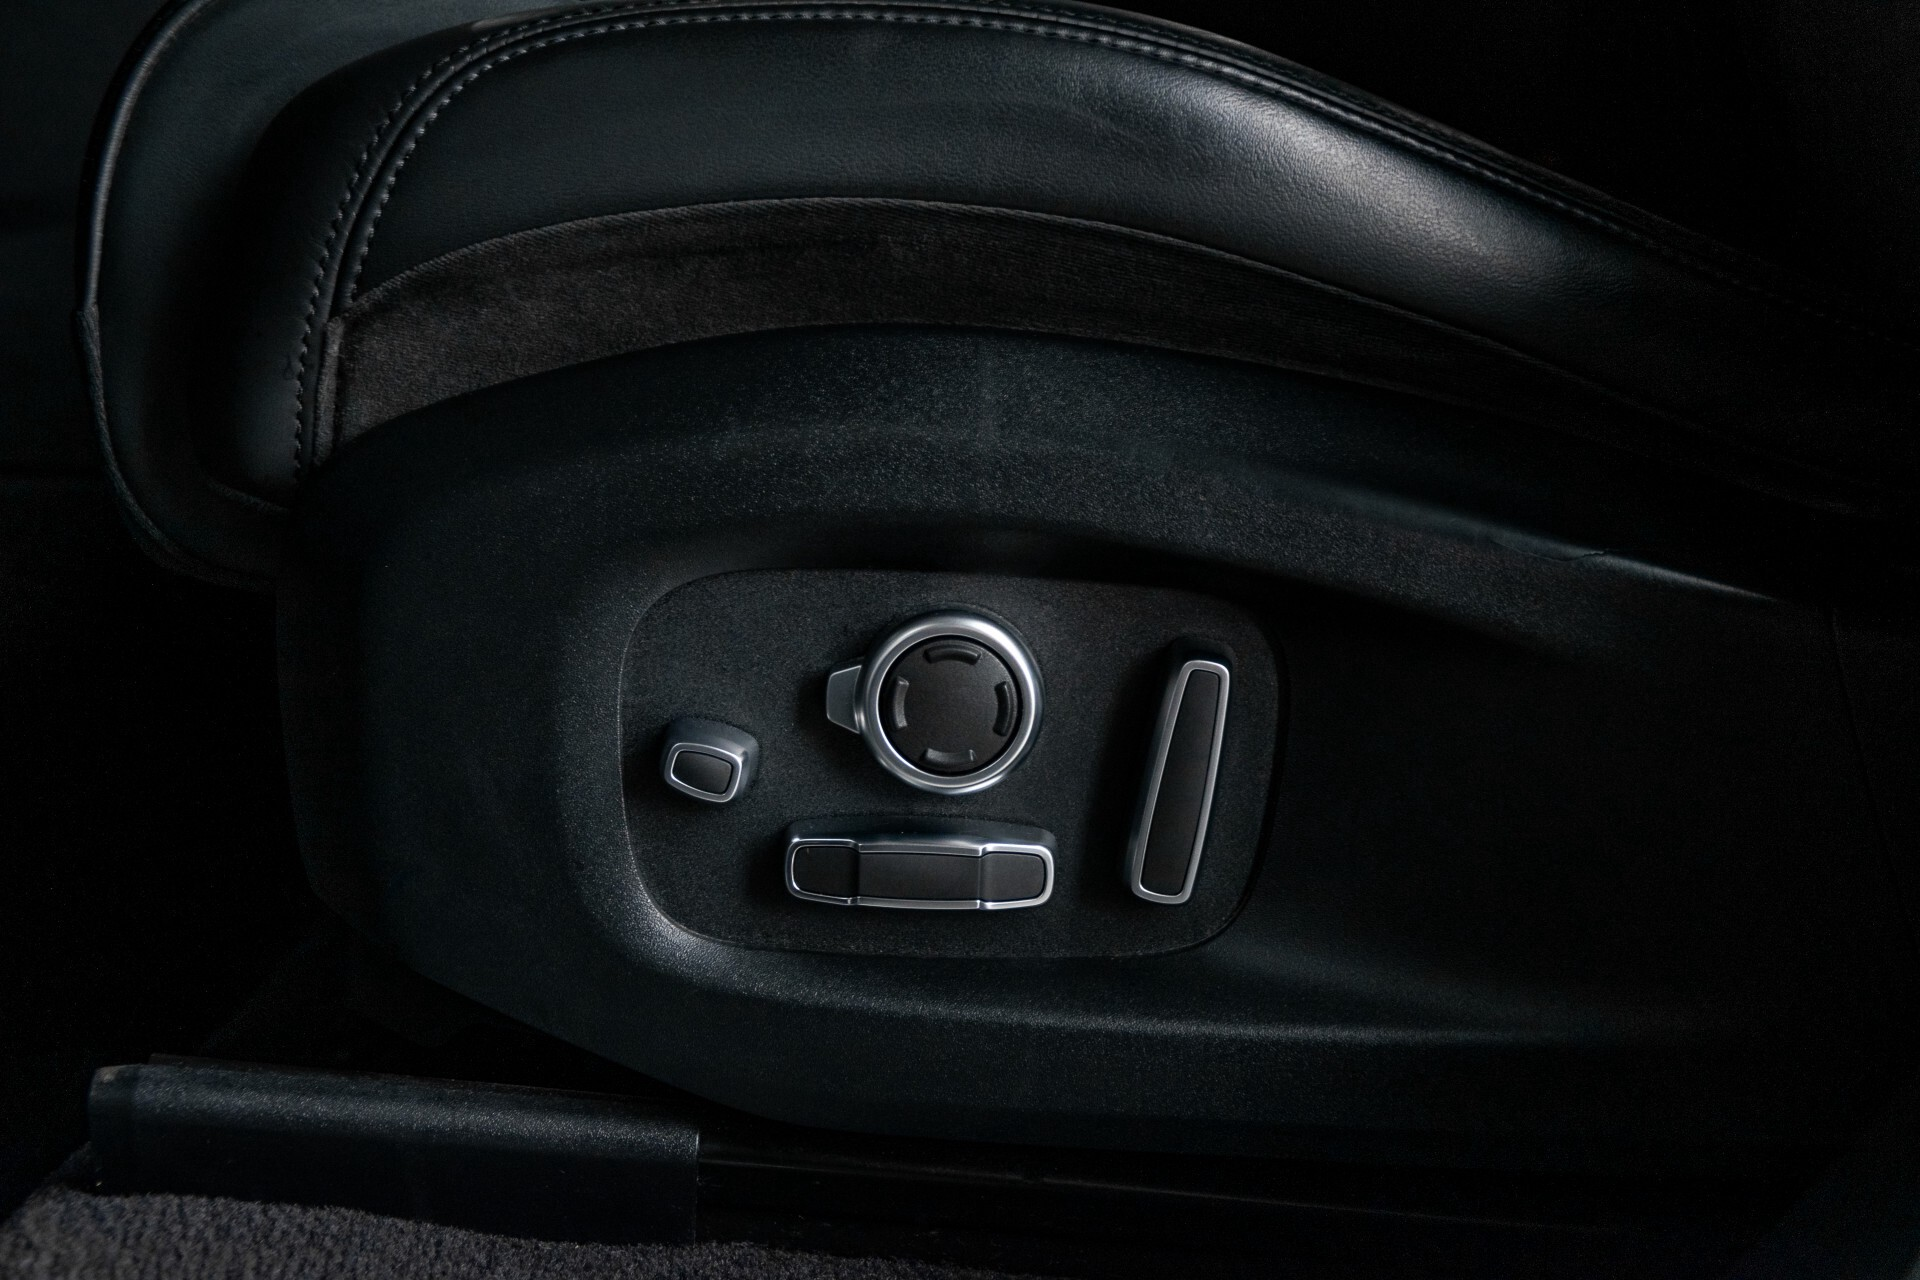 Land Rover Range Rover Sport SVR 5.0 Supercharged 575pk Full Carbon Nieuwprijs €241377 Foto 45